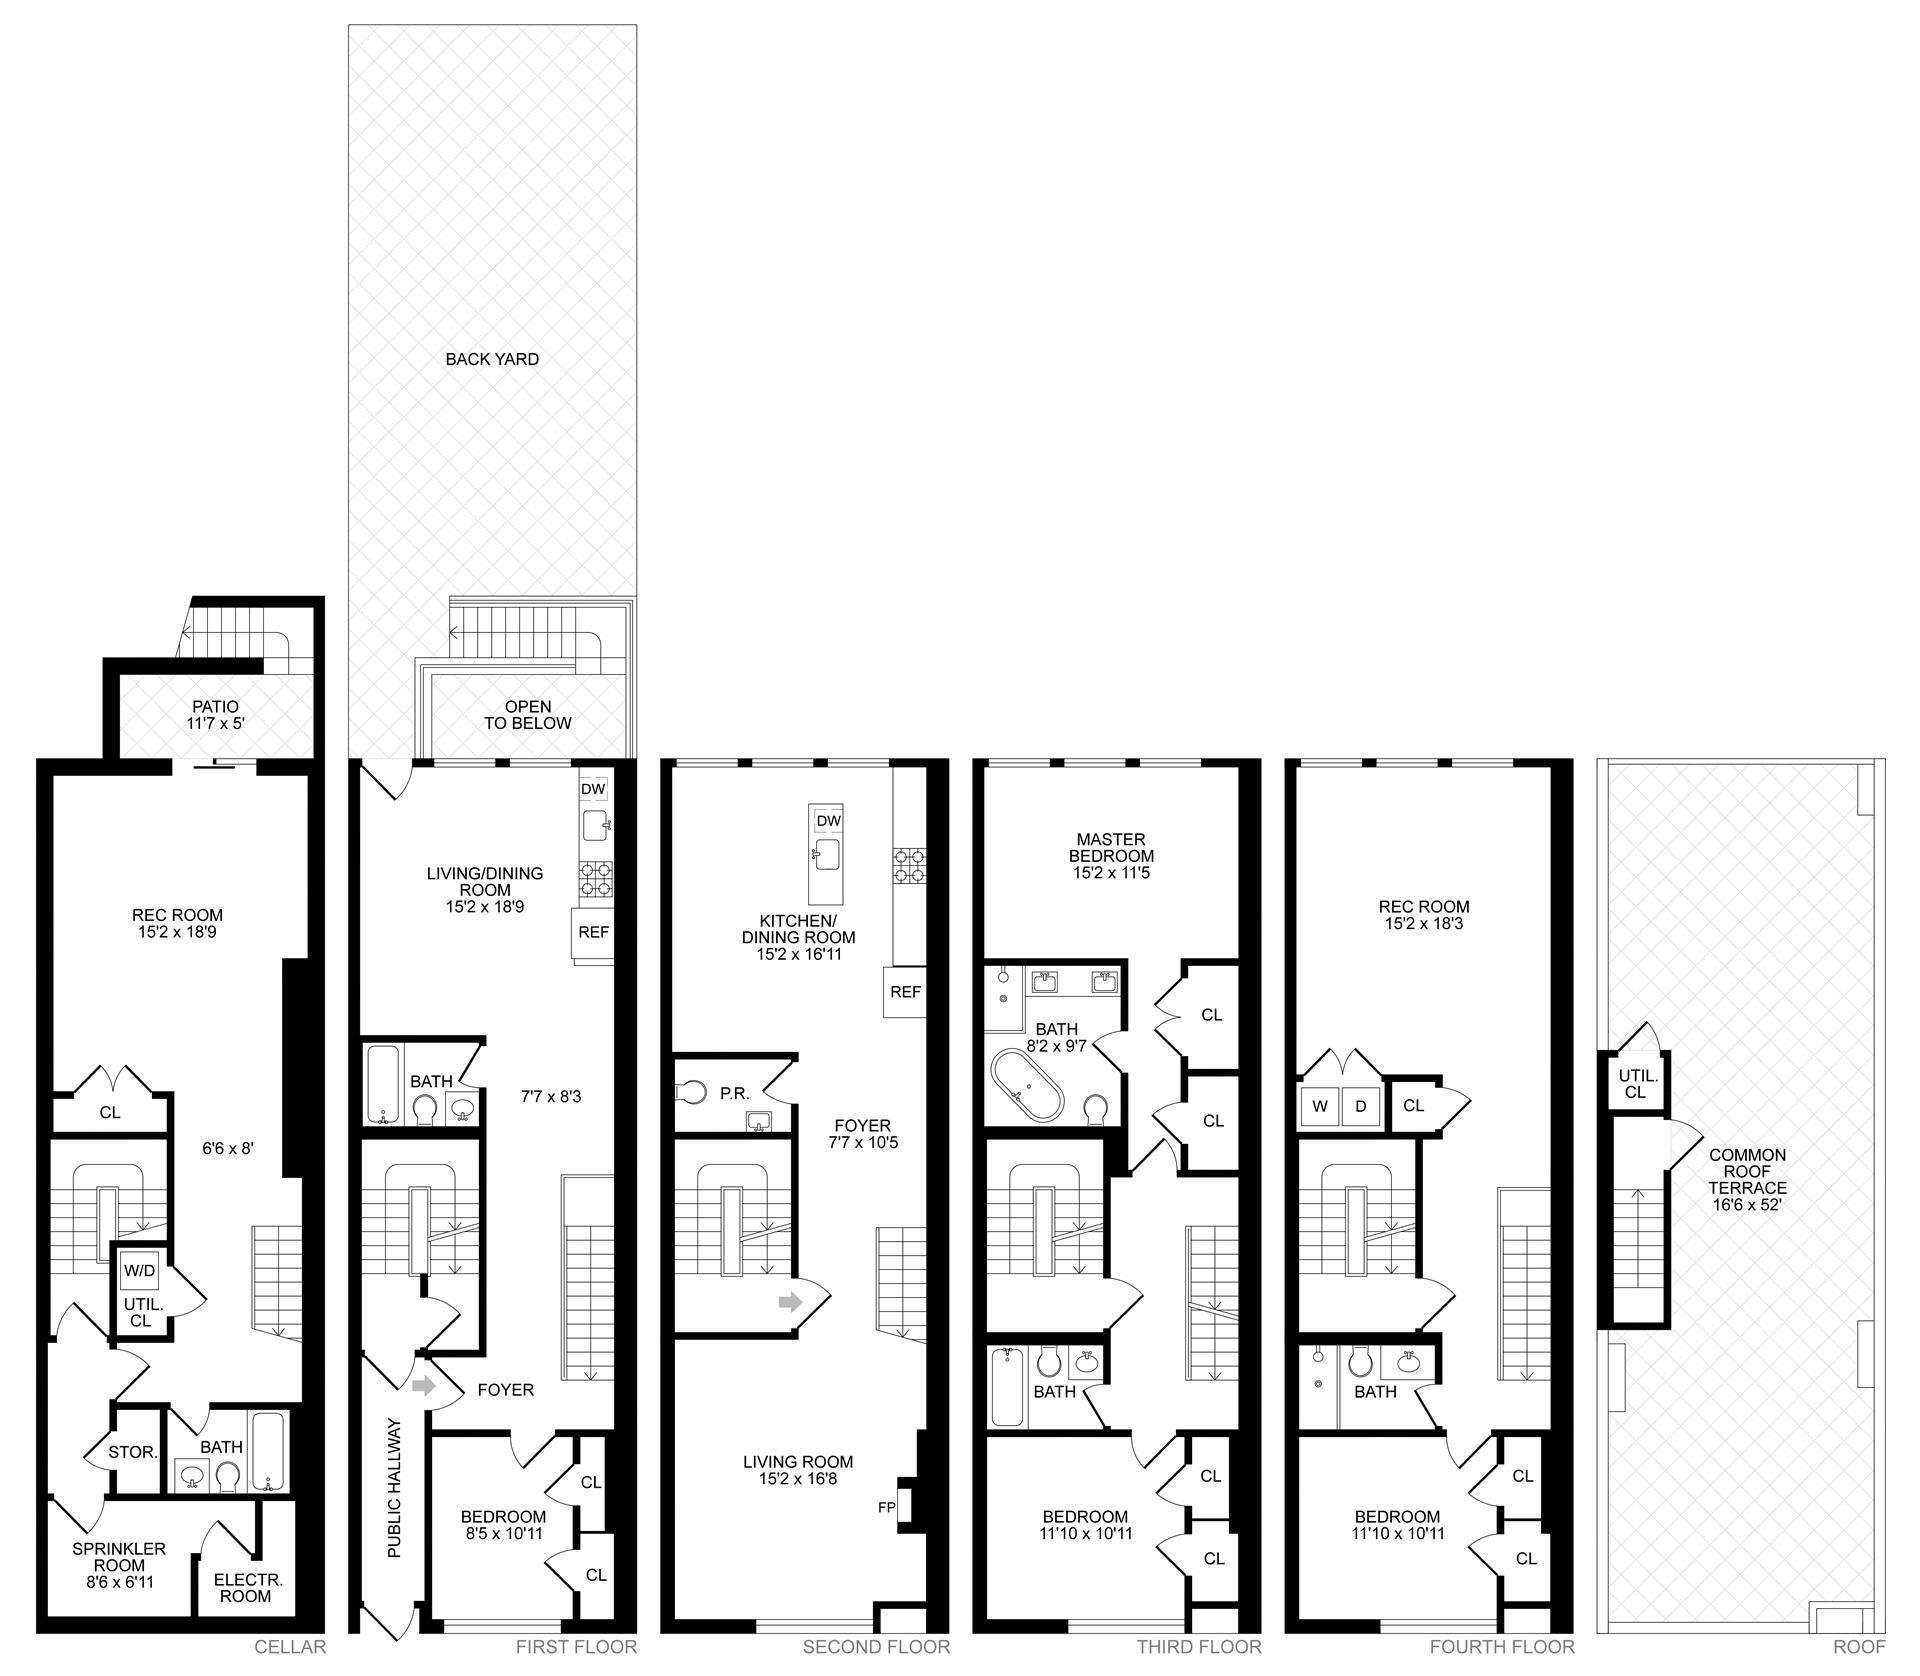 Floor plan of 72 Clifton Pl - Clinton Hill, New York